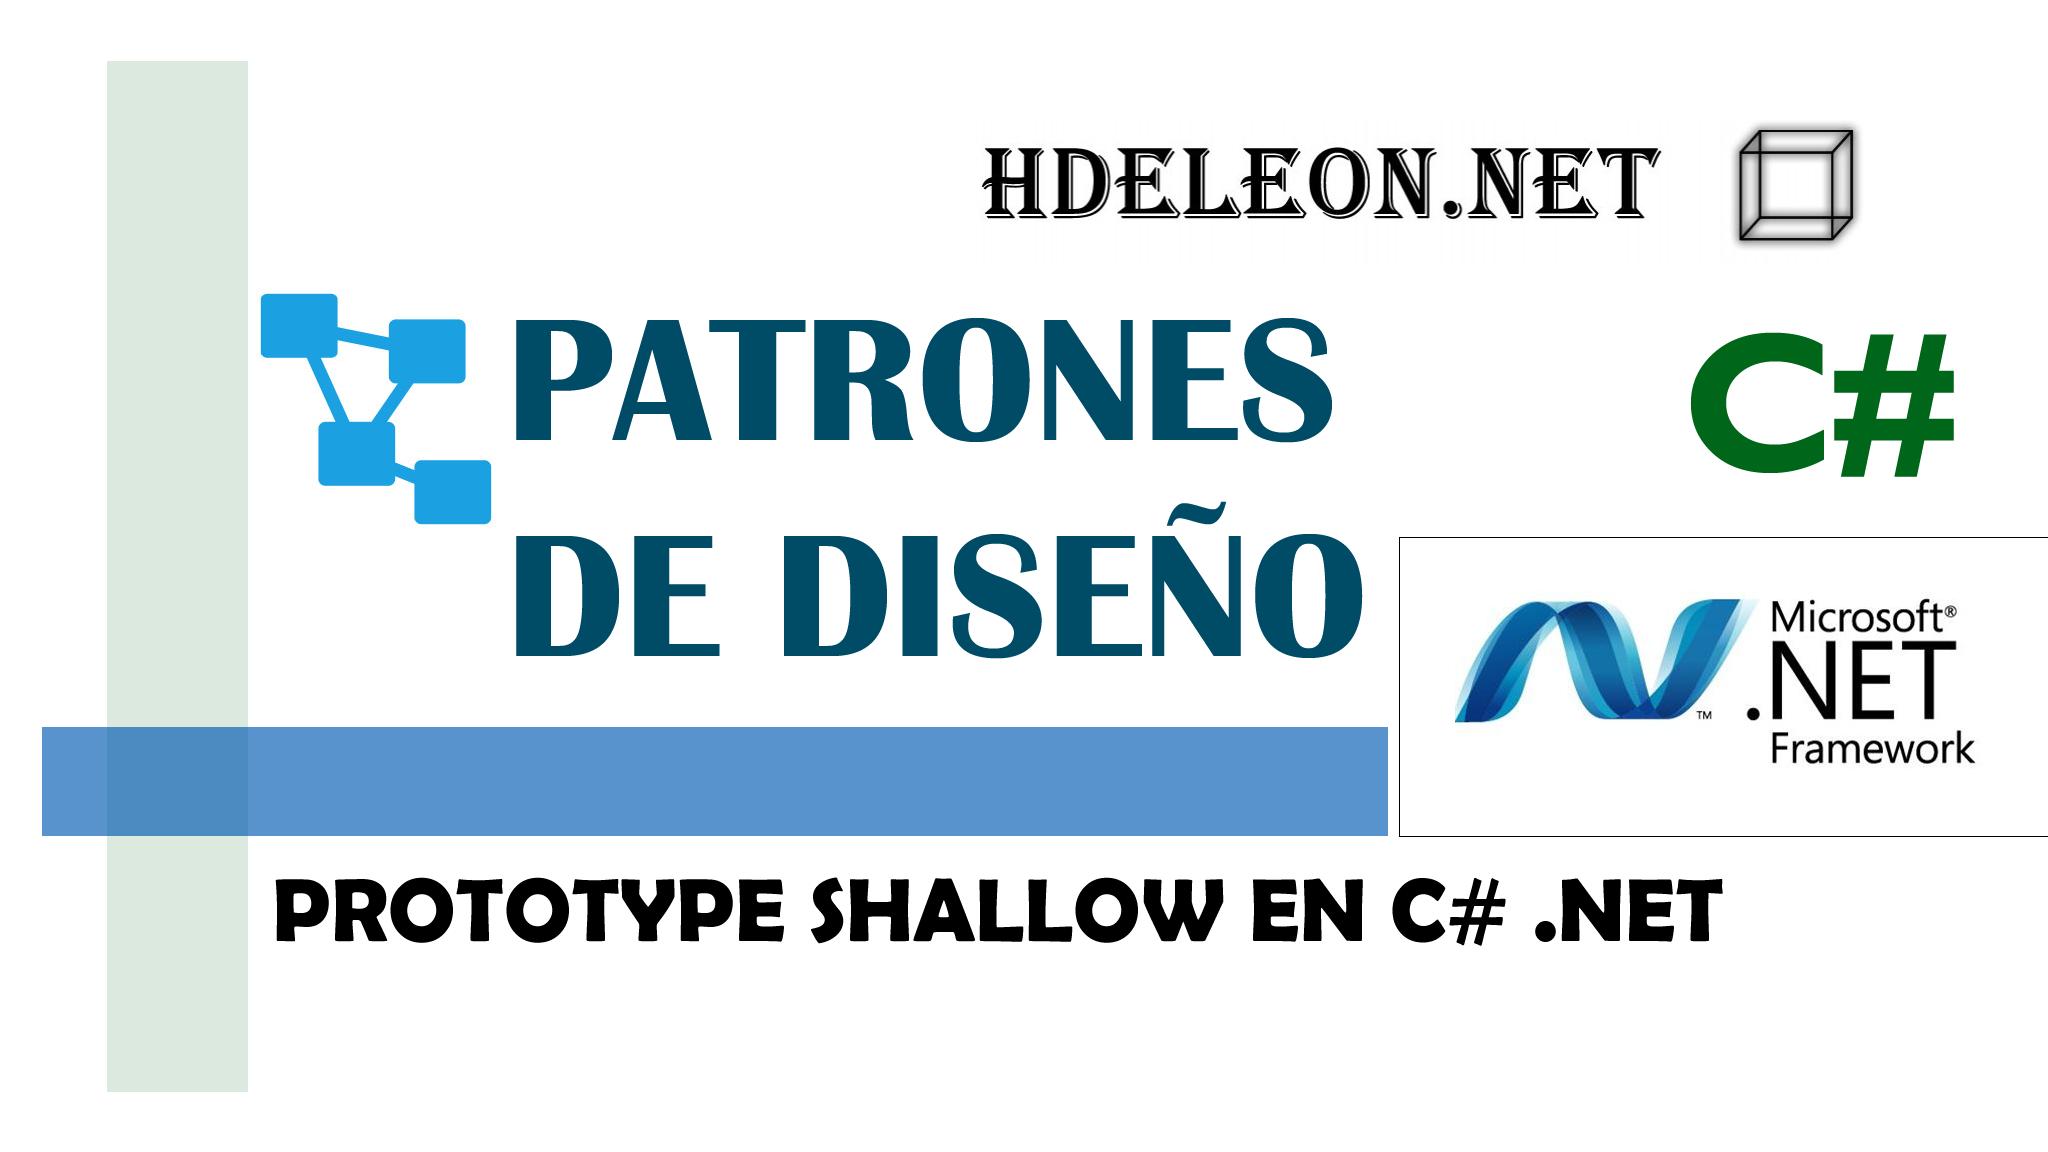 Prototype shallow en C# .Net, Patrones de diseño, design patterns, #2